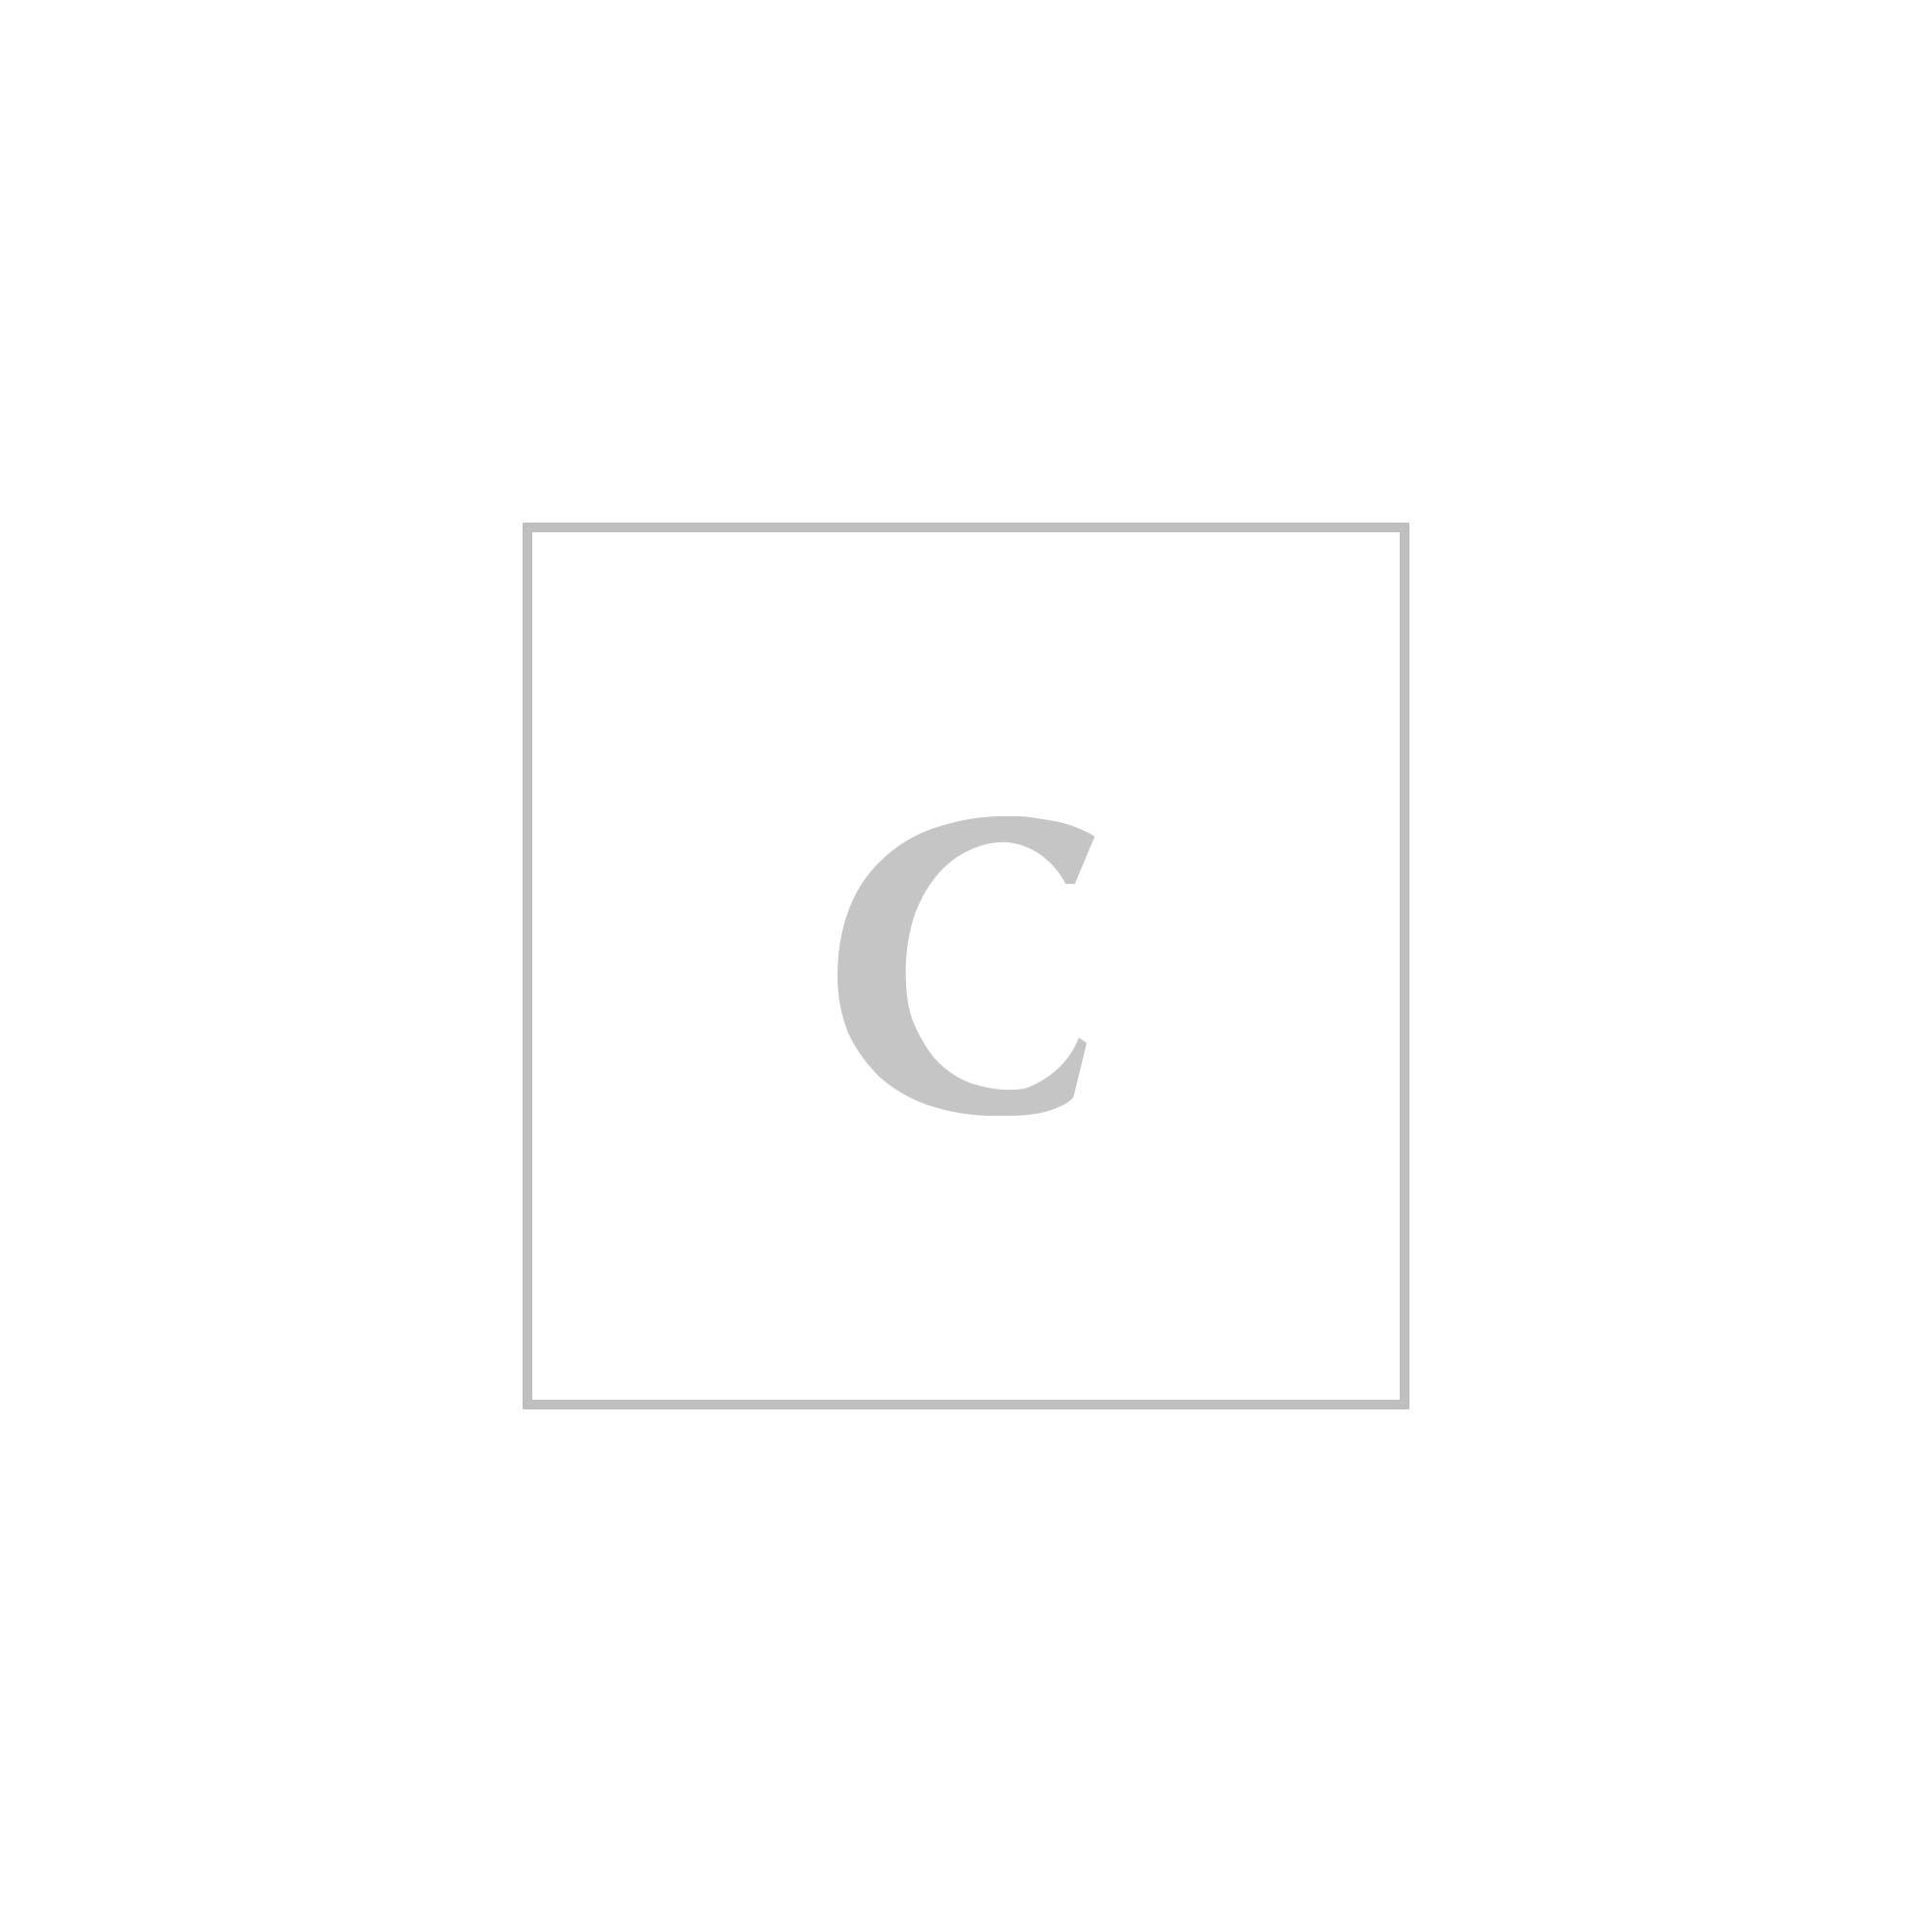 Stella mccartney borsa falabella cross body